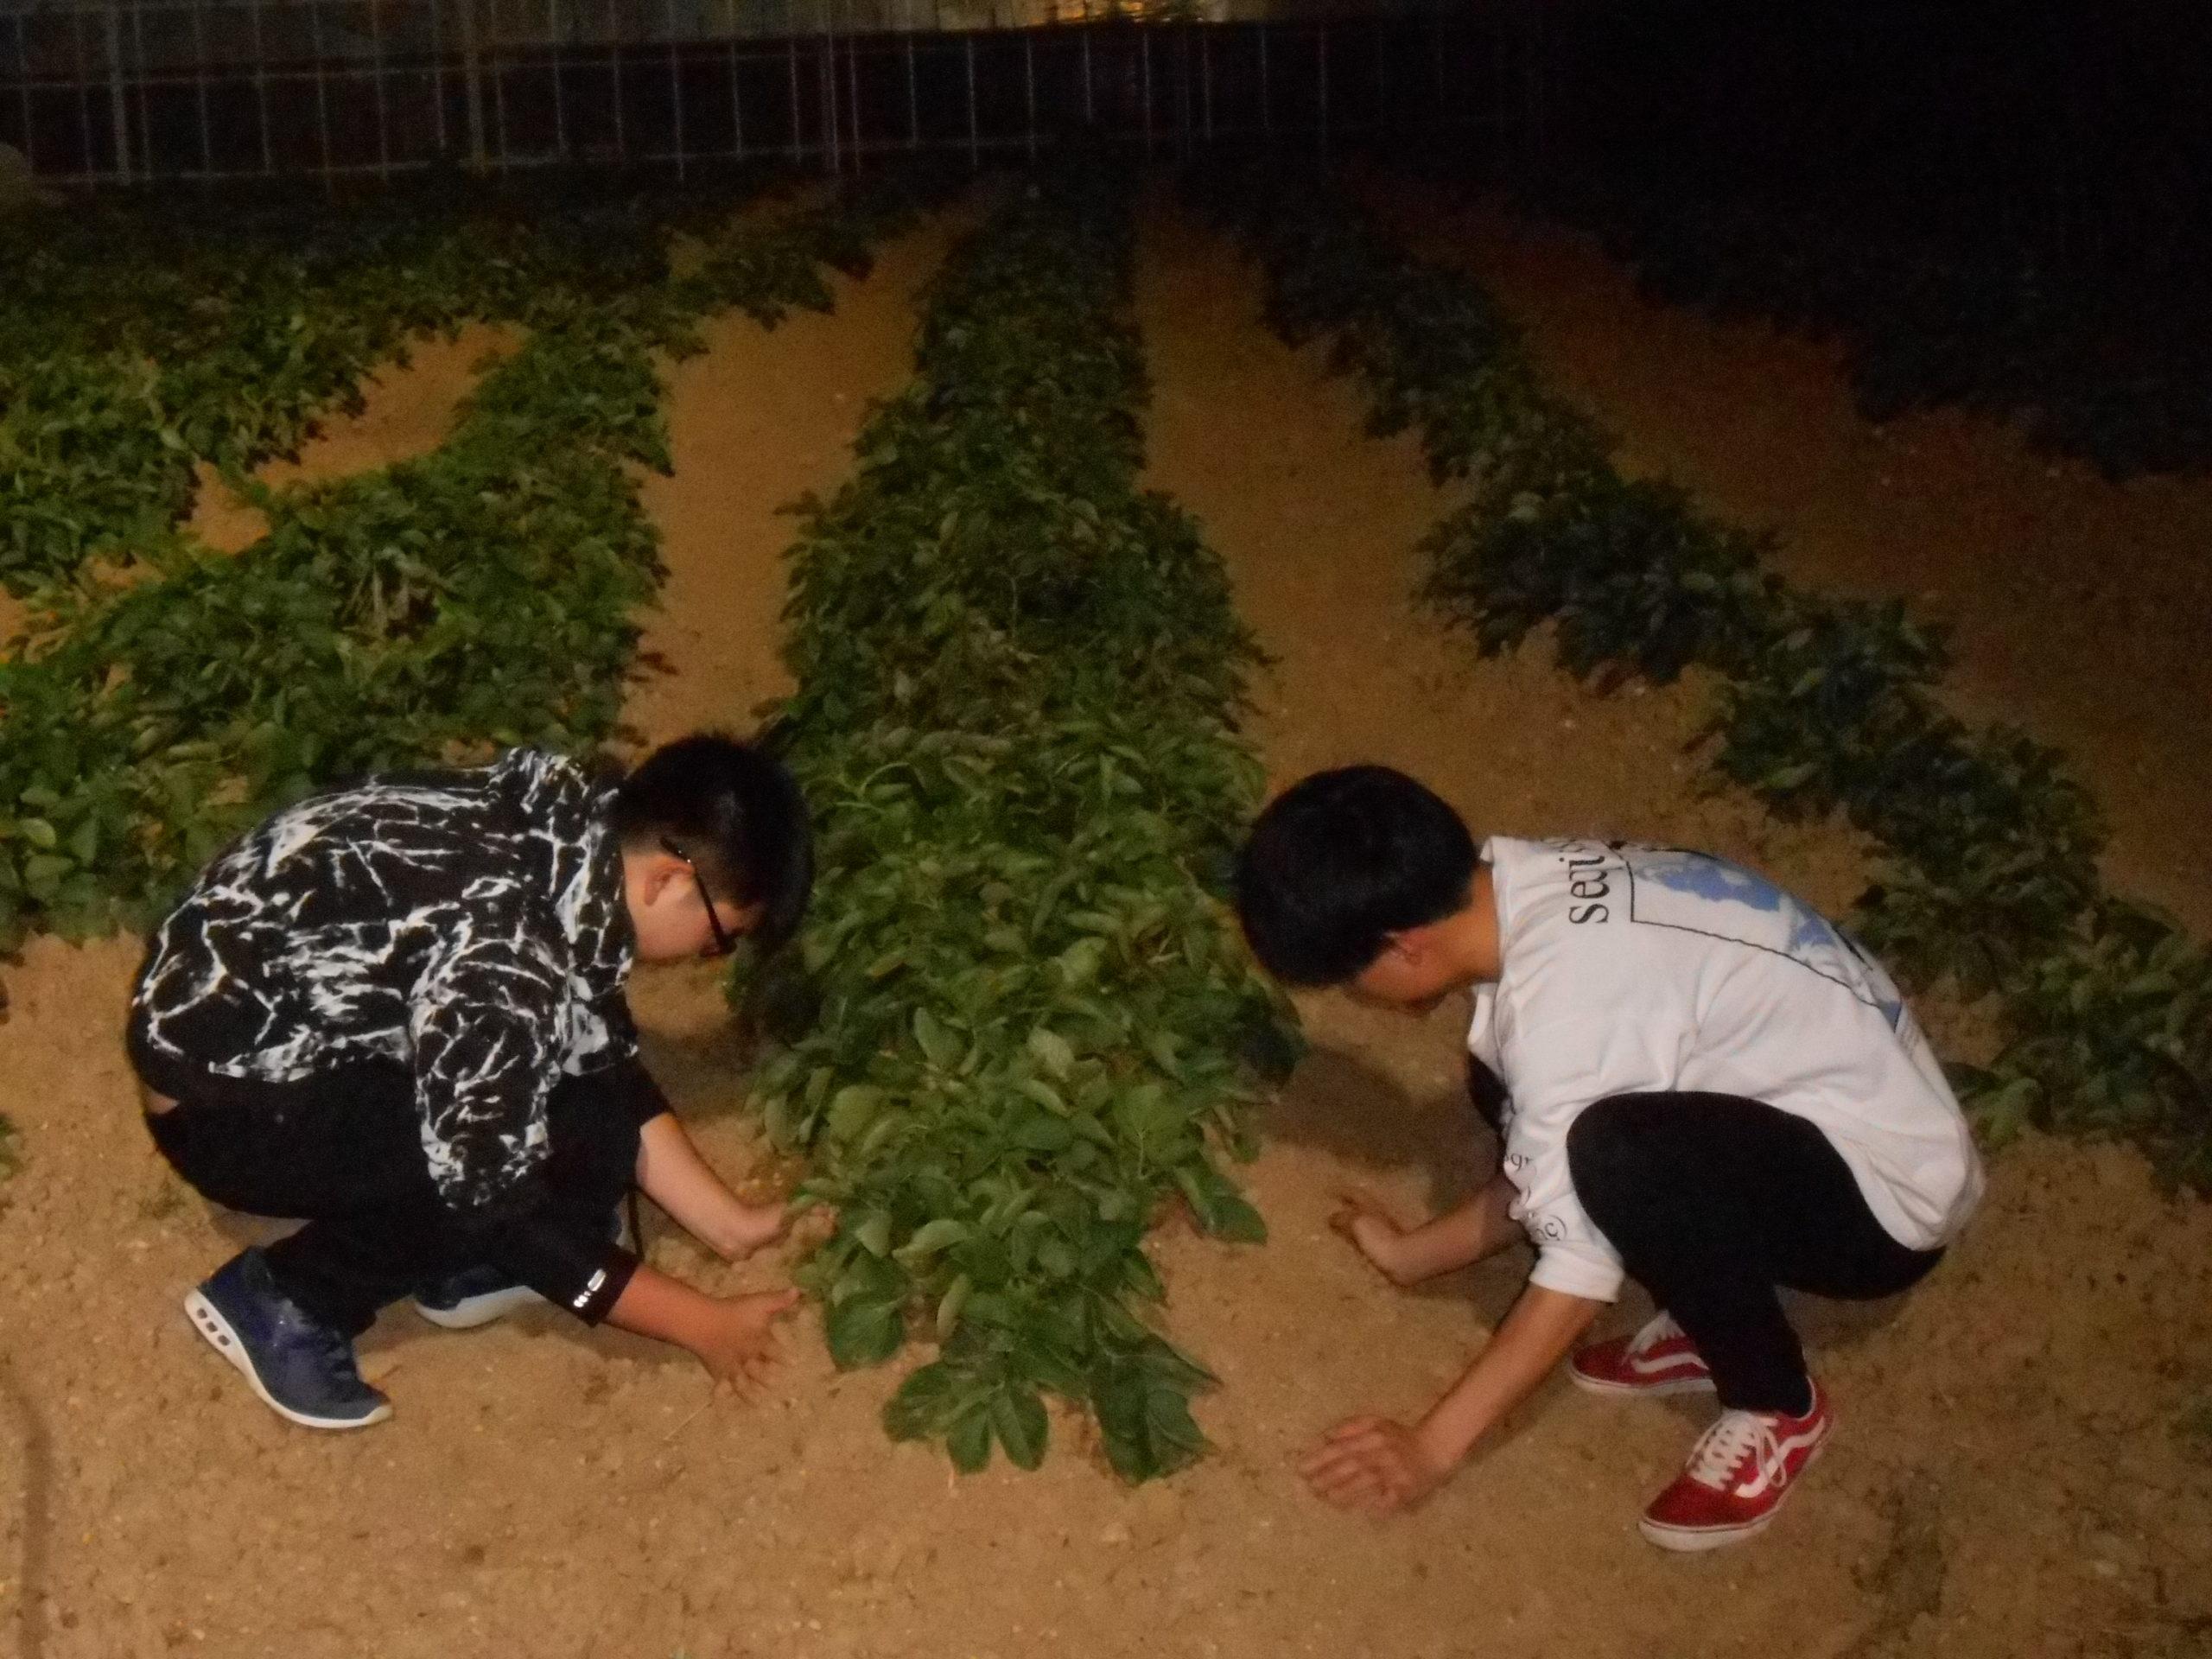 A野菜露地の写真を変更②-scaled.jpg